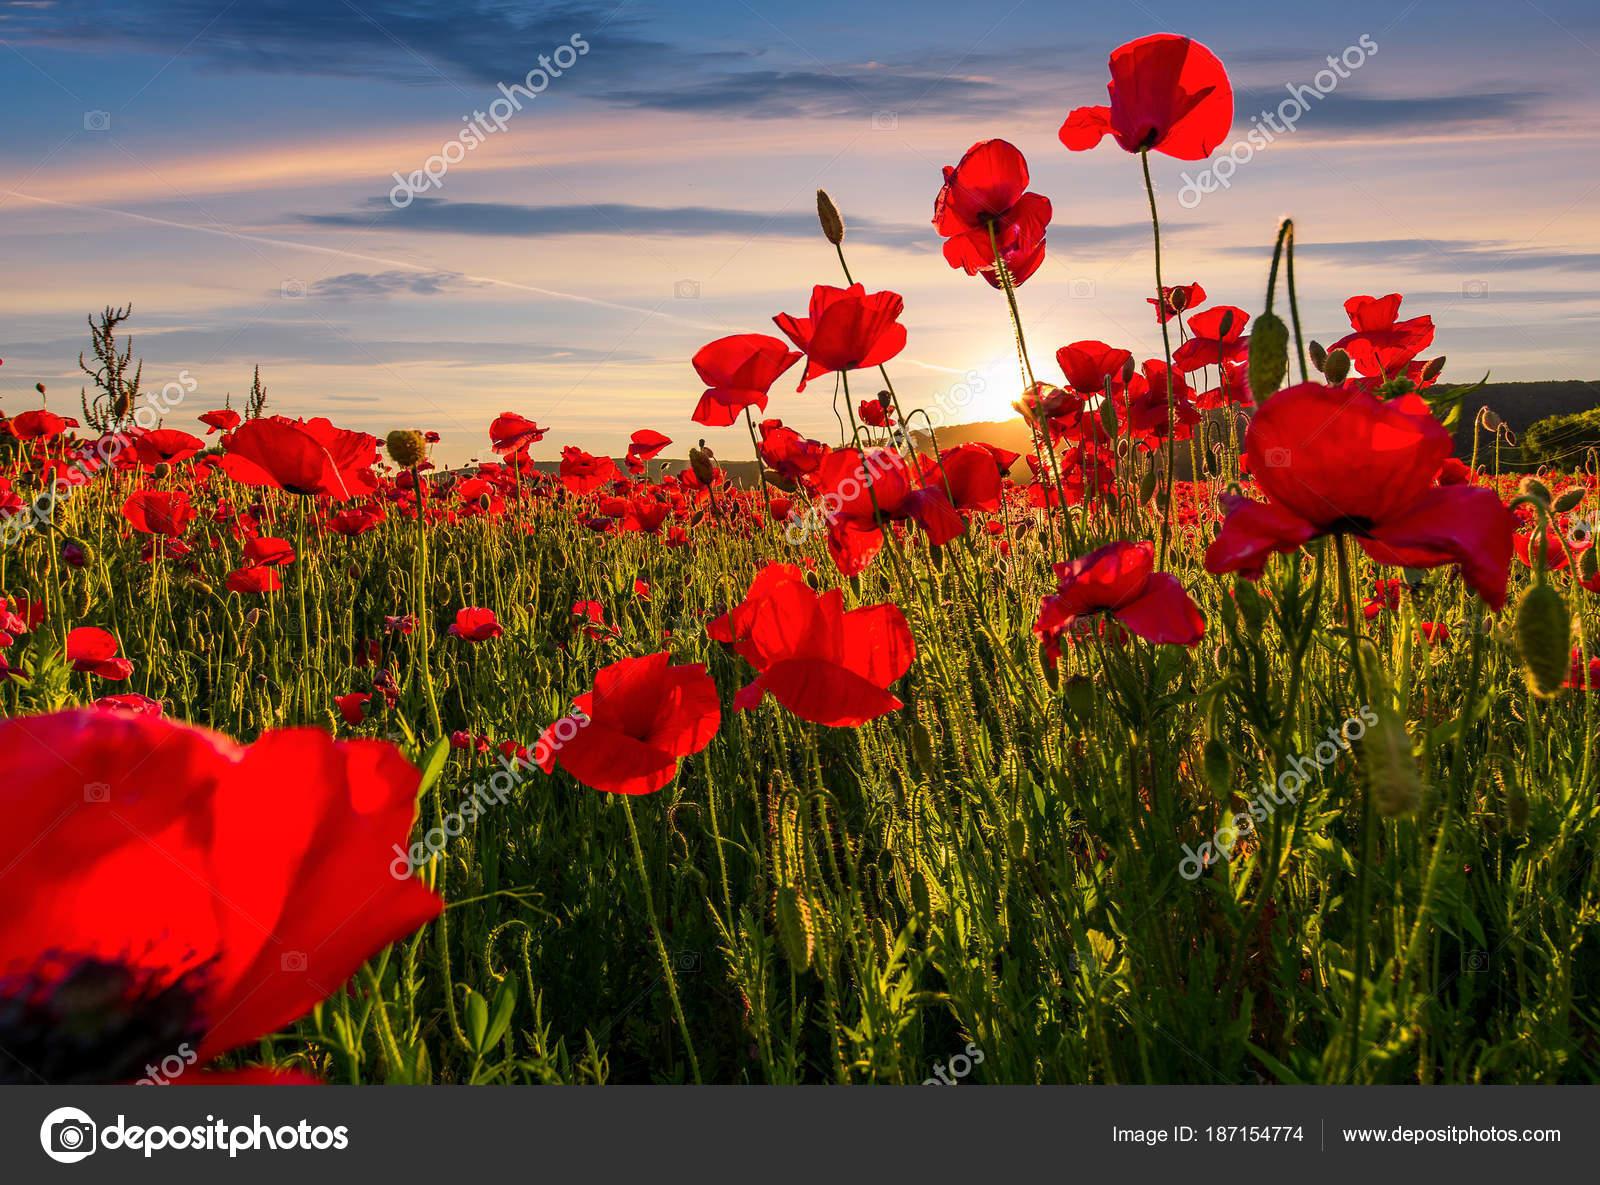 Poppy Flowers Field In Mountains Stock Photo Pellinni 187154774